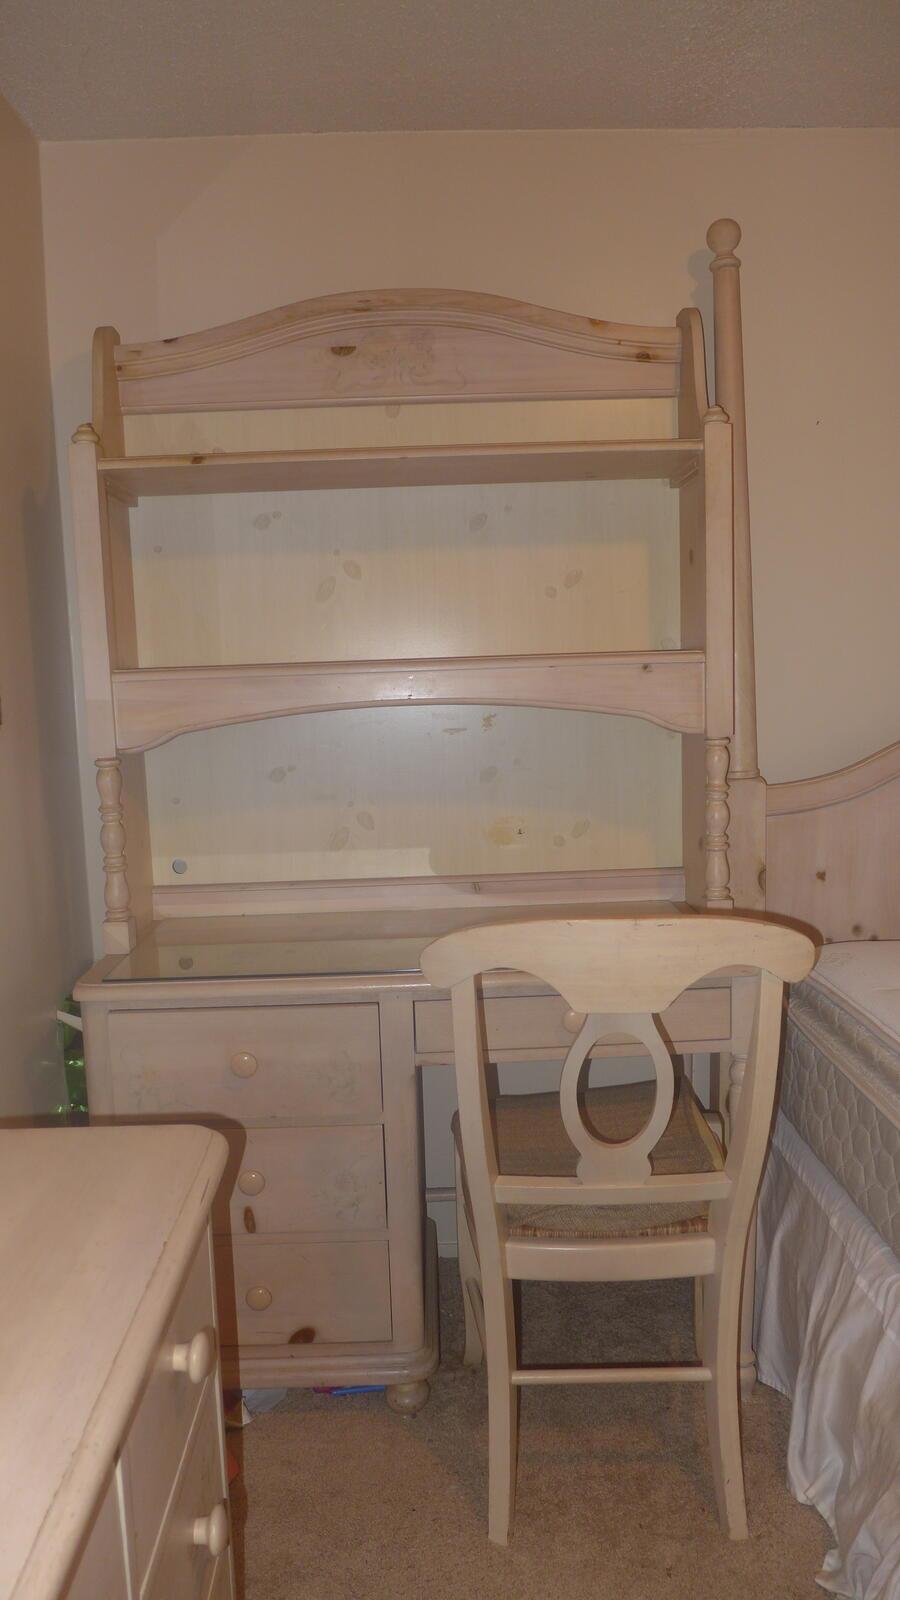 190 Thomasville Impressions Bedroom Set Full Bed Dresser Mirror Desk Chair For Sale Free Nextdoor